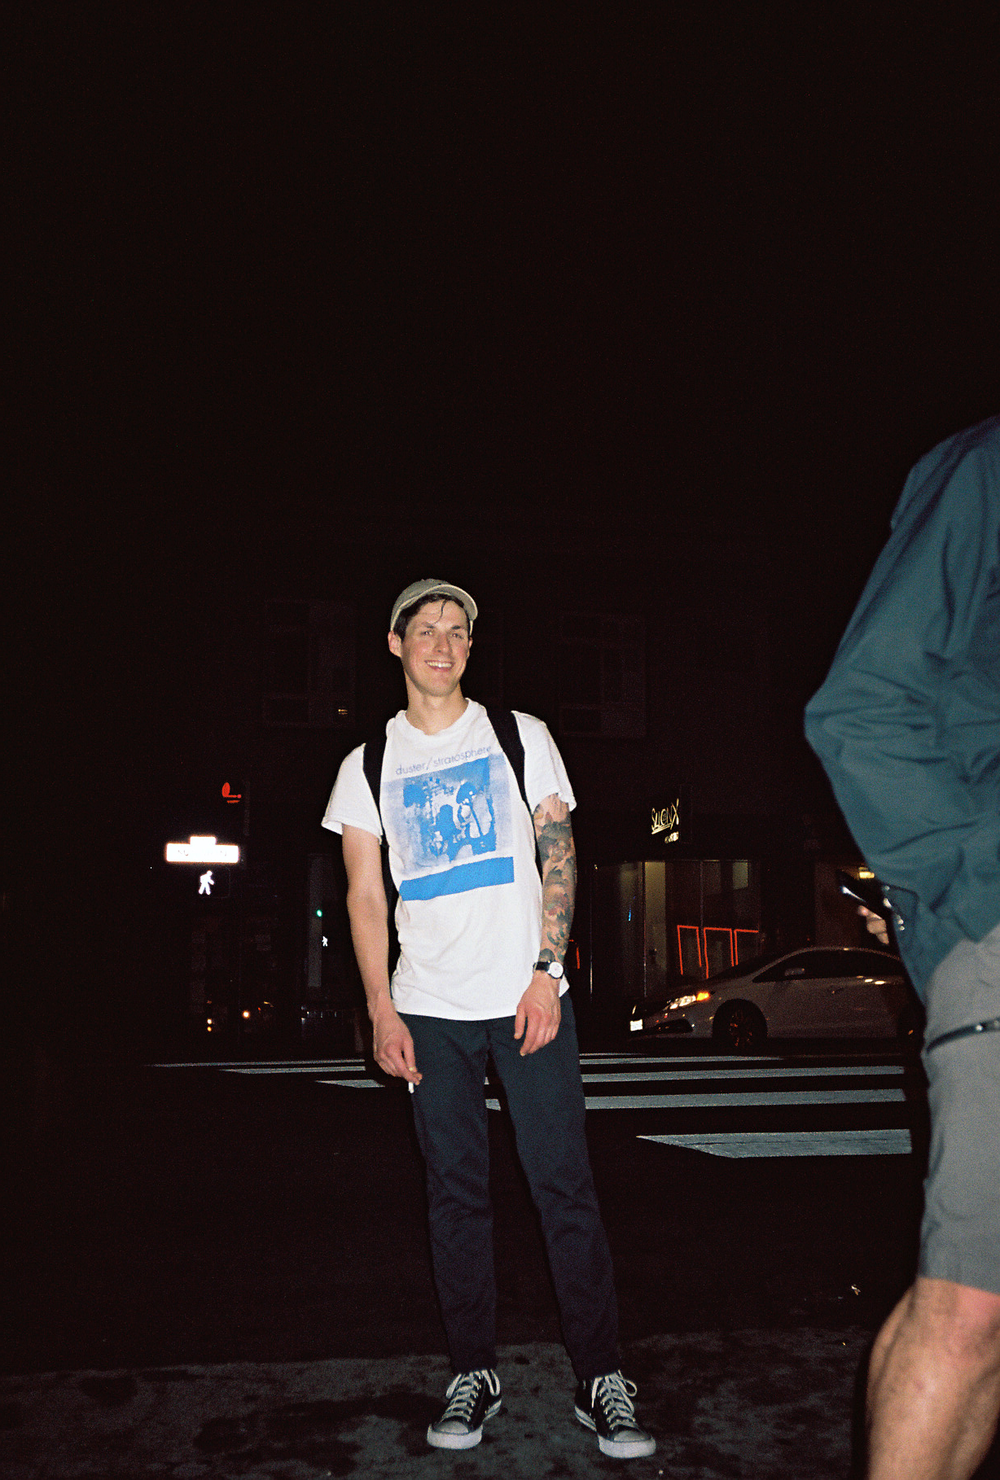 Matt Curtis: Mission Street Smile